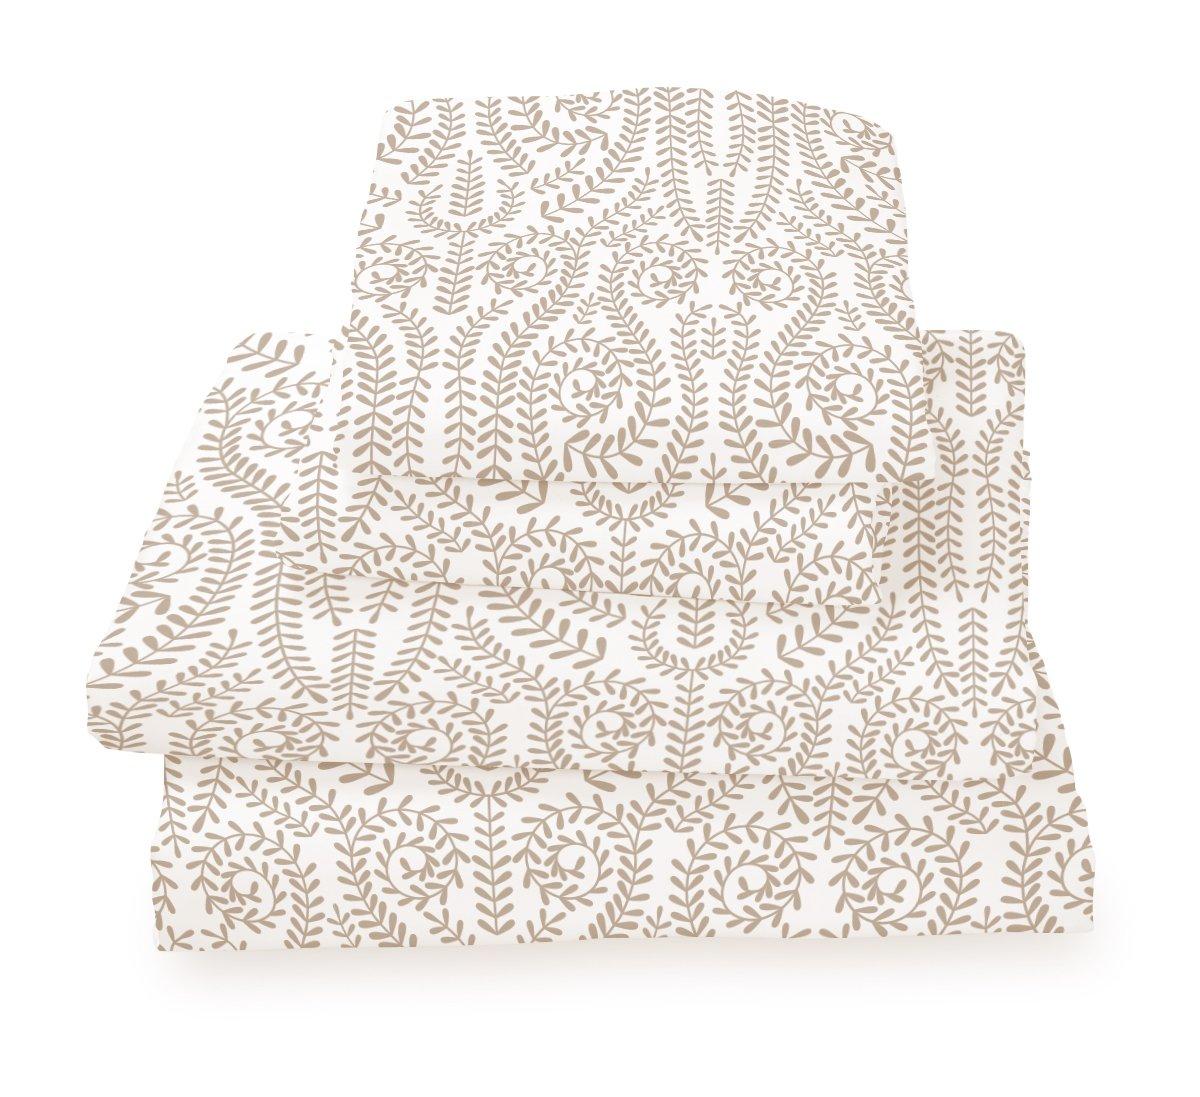 Queen Sheet Set Khaki Vine - Double Brushed Ultra Microfiber Luxury Bedding Set